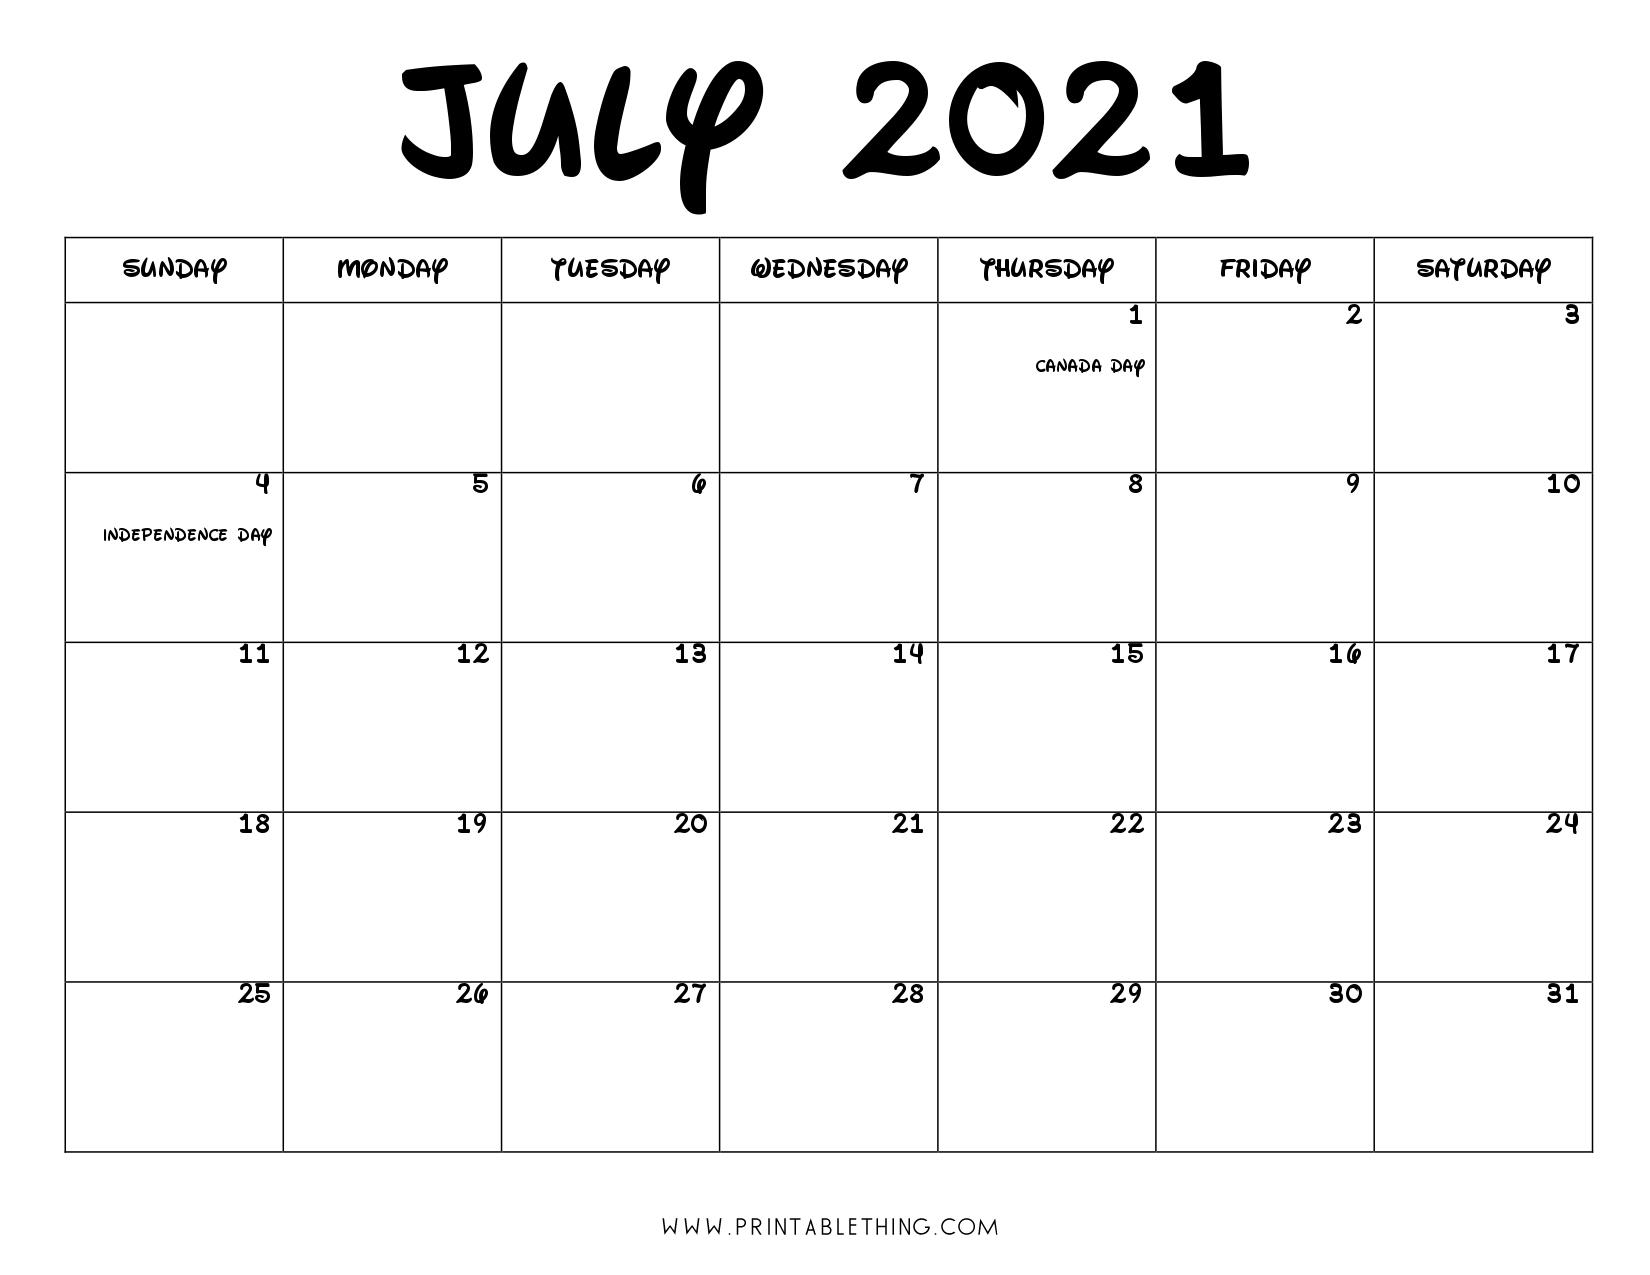 July 2021 Calendar PDF, July 2021 Calendar Image, Print ...